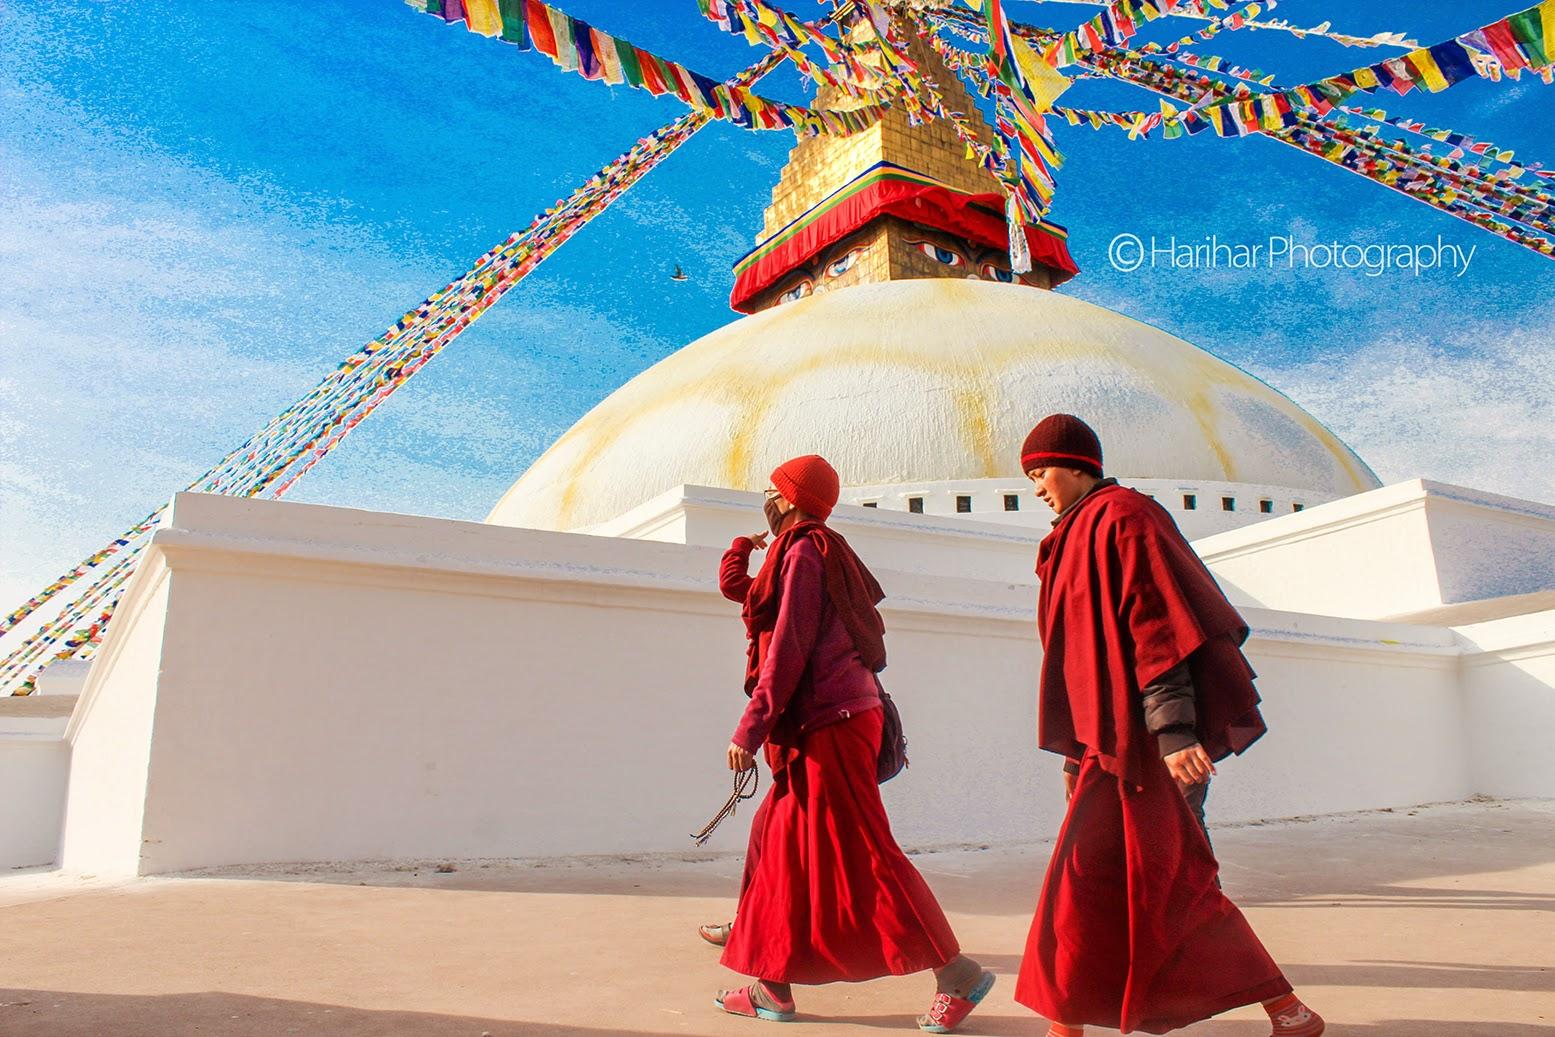 Boudhanath Stupa Nepal, Harihar Photography, tour in Nepal, Nepal Travel